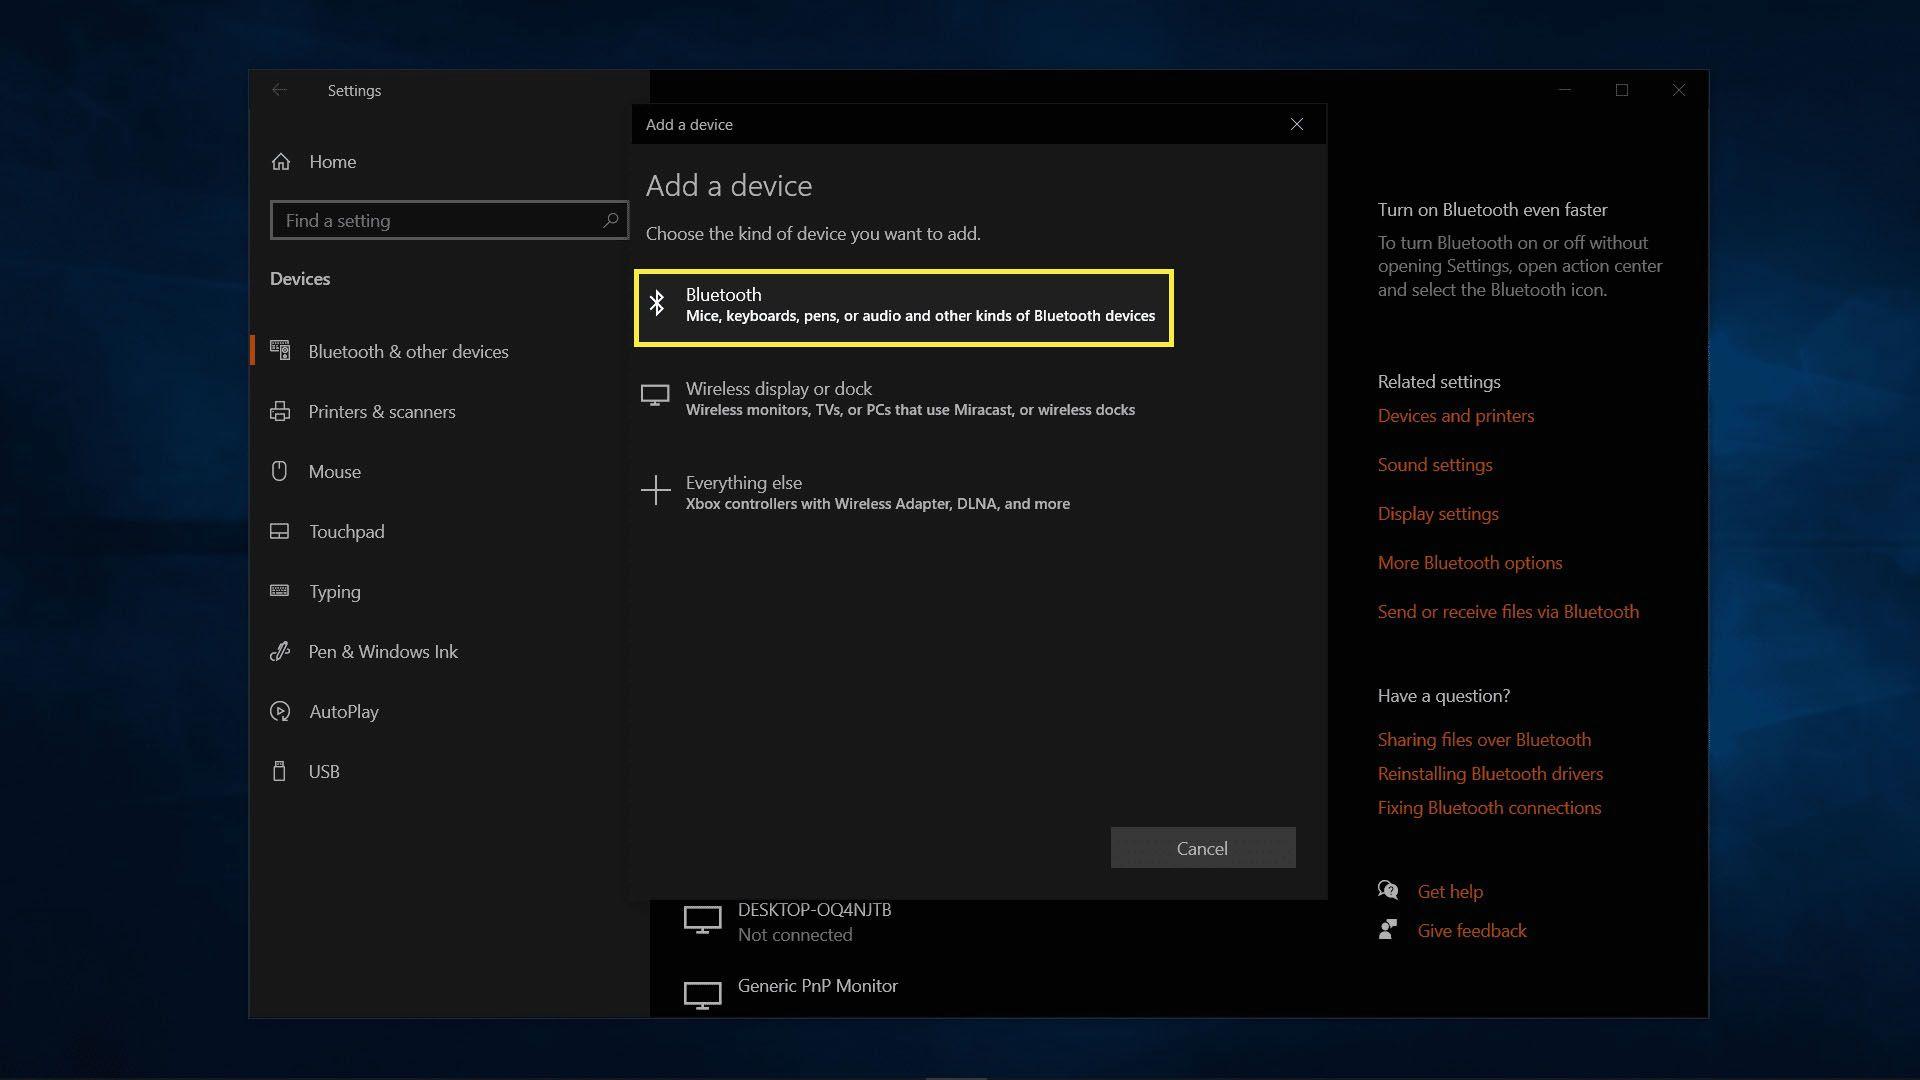 Adding a device on Windows 10.